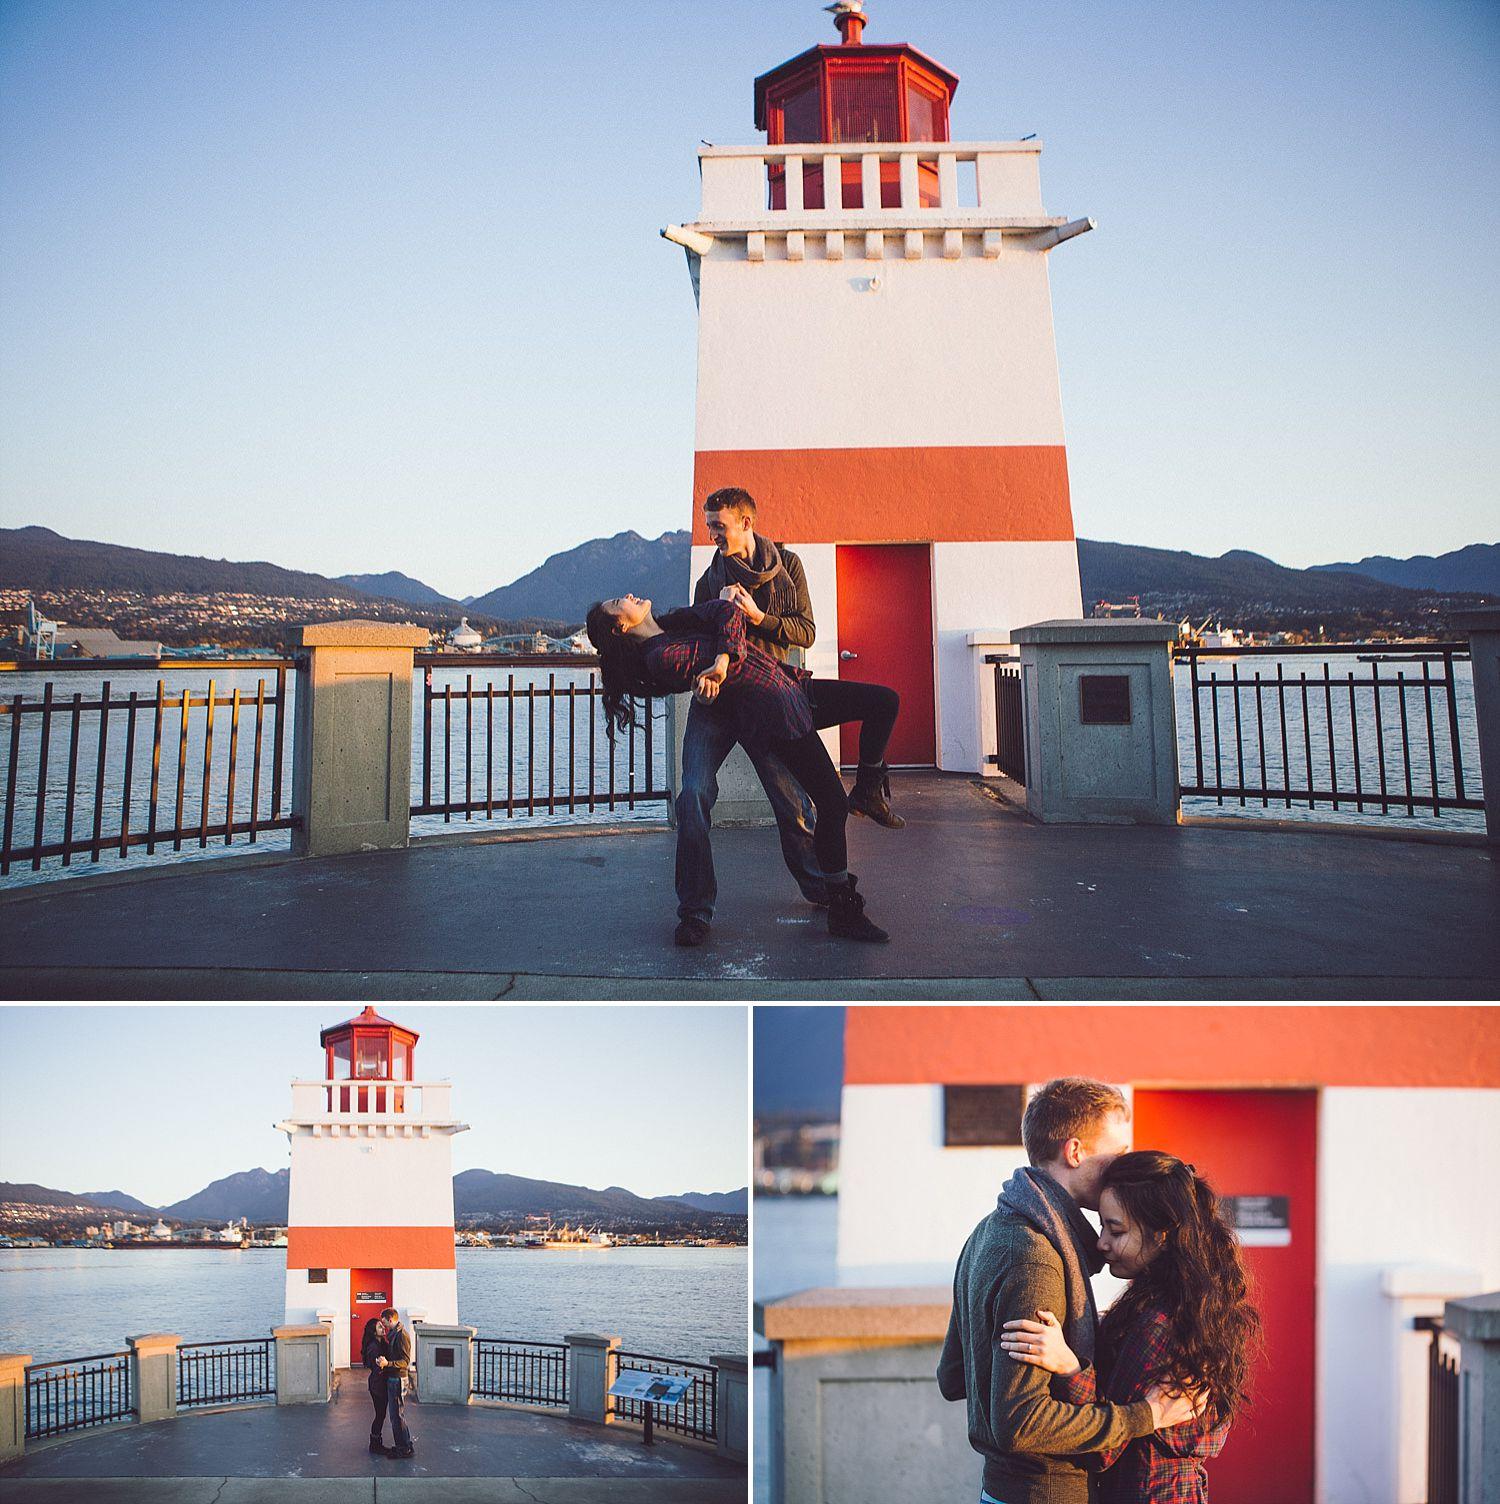 Couple dances at the Brockton Point Lighthouse